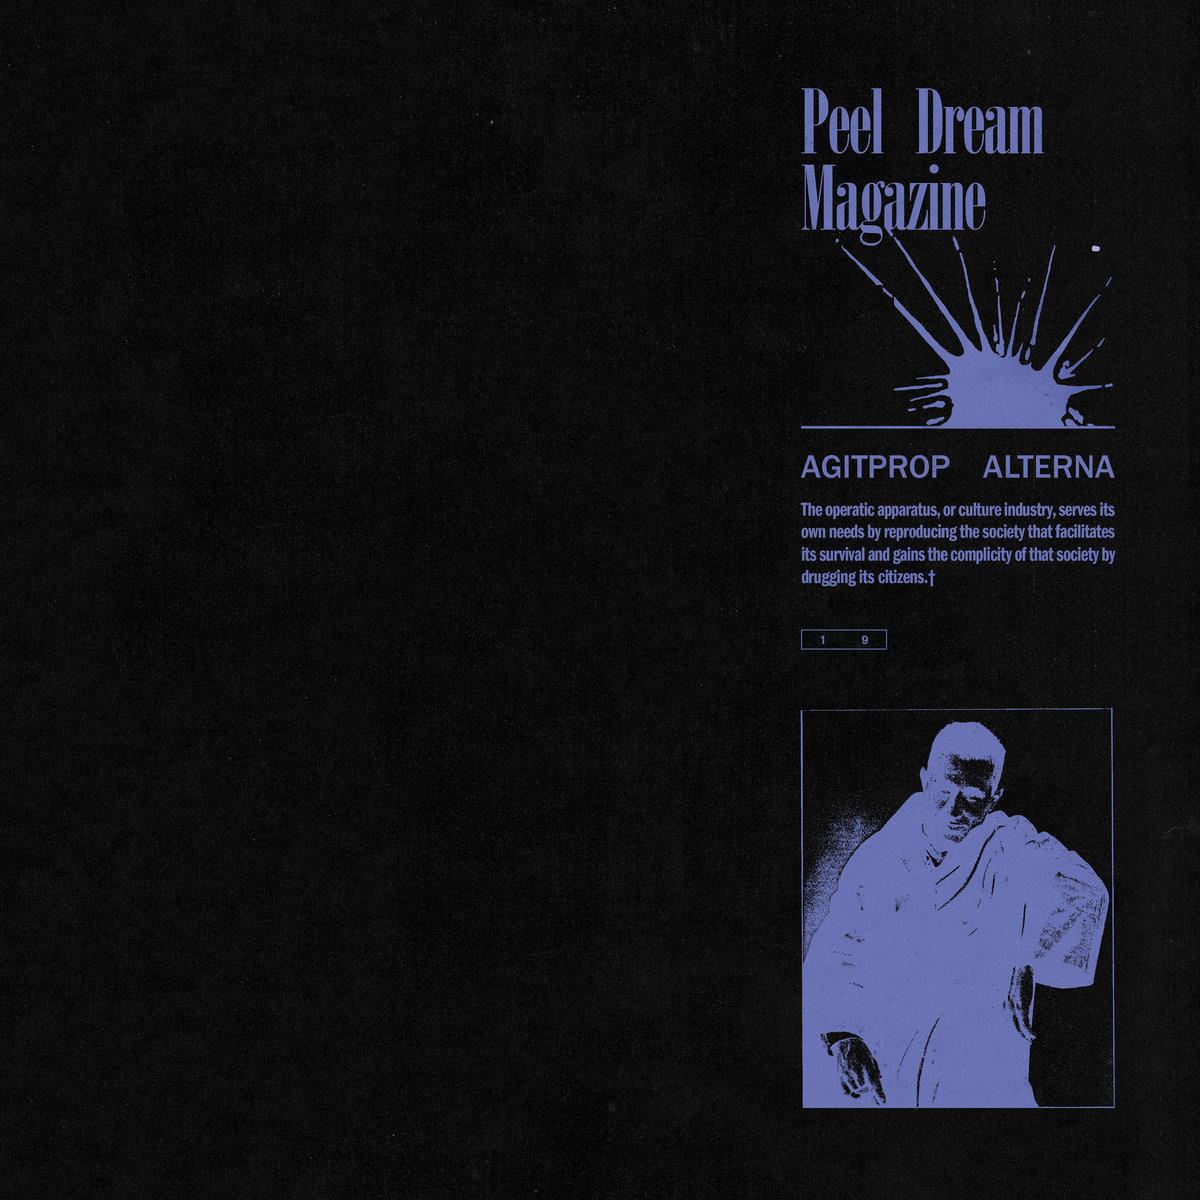 pochette de l'album Agitprop alterna du groupe Peel Dream Magazine